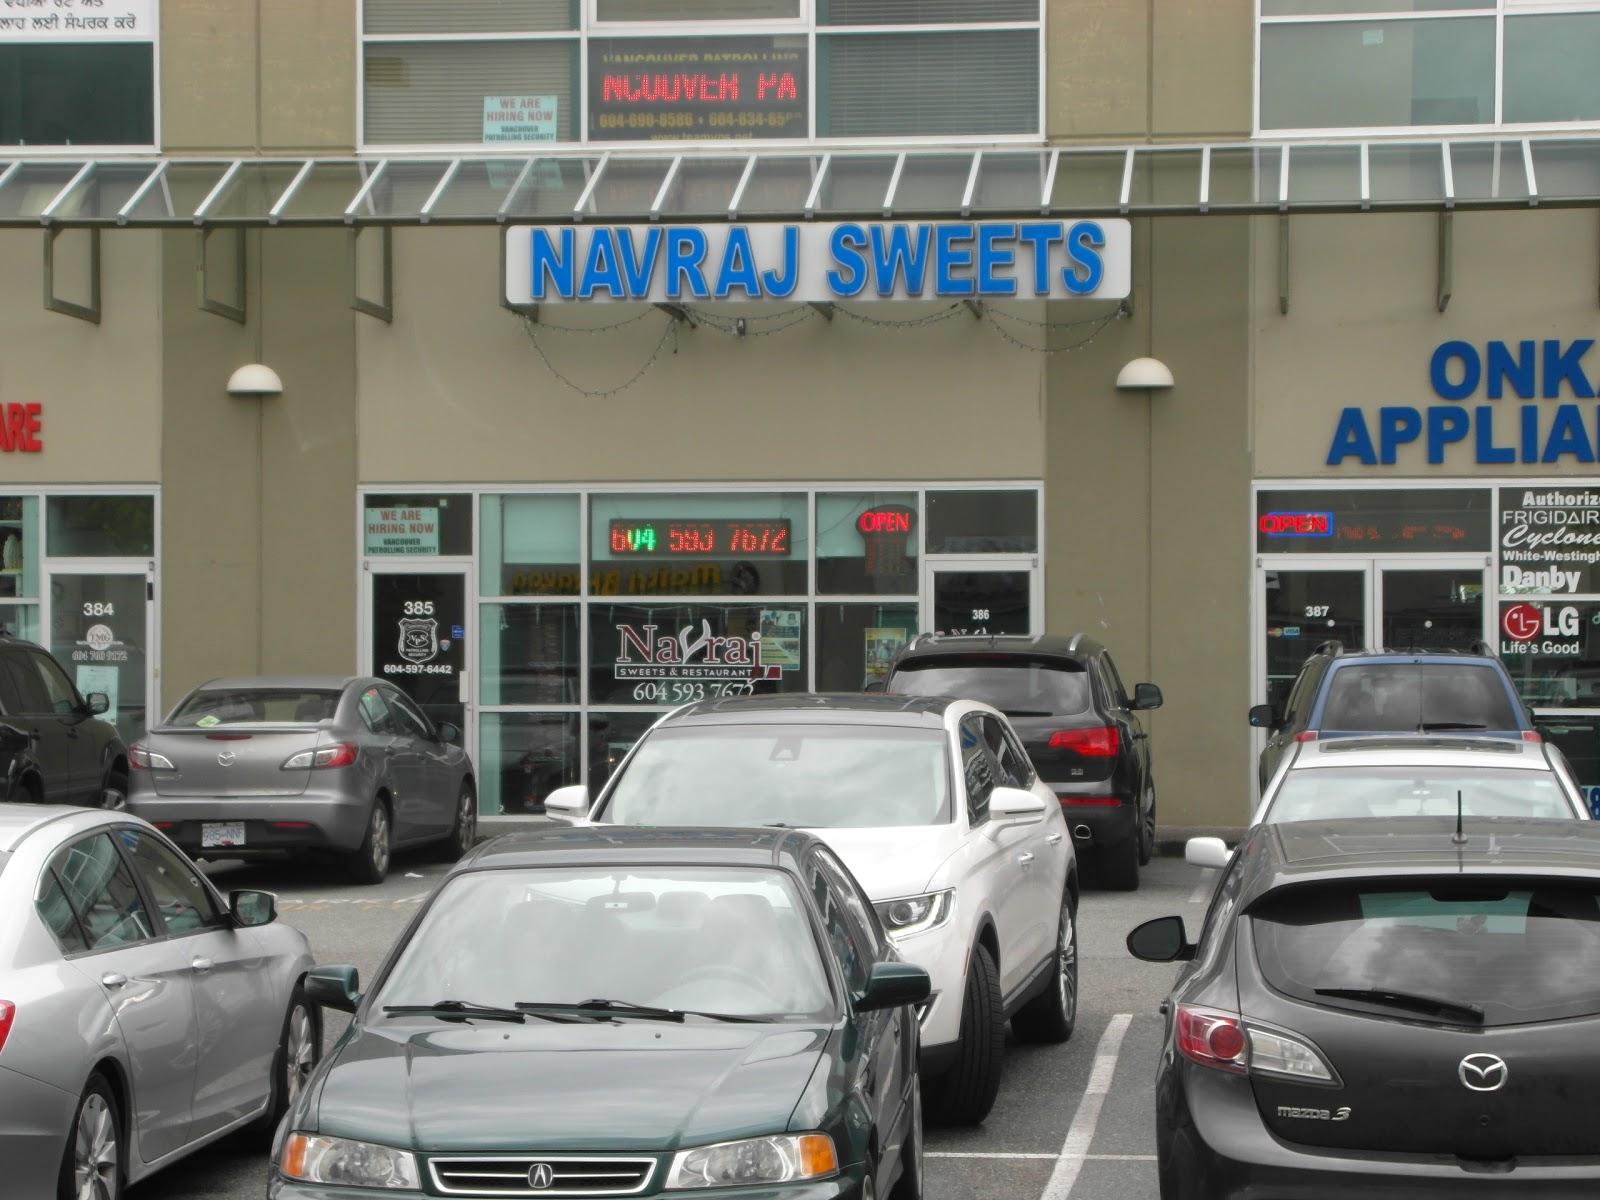 Navraj Sweets & Restaurant